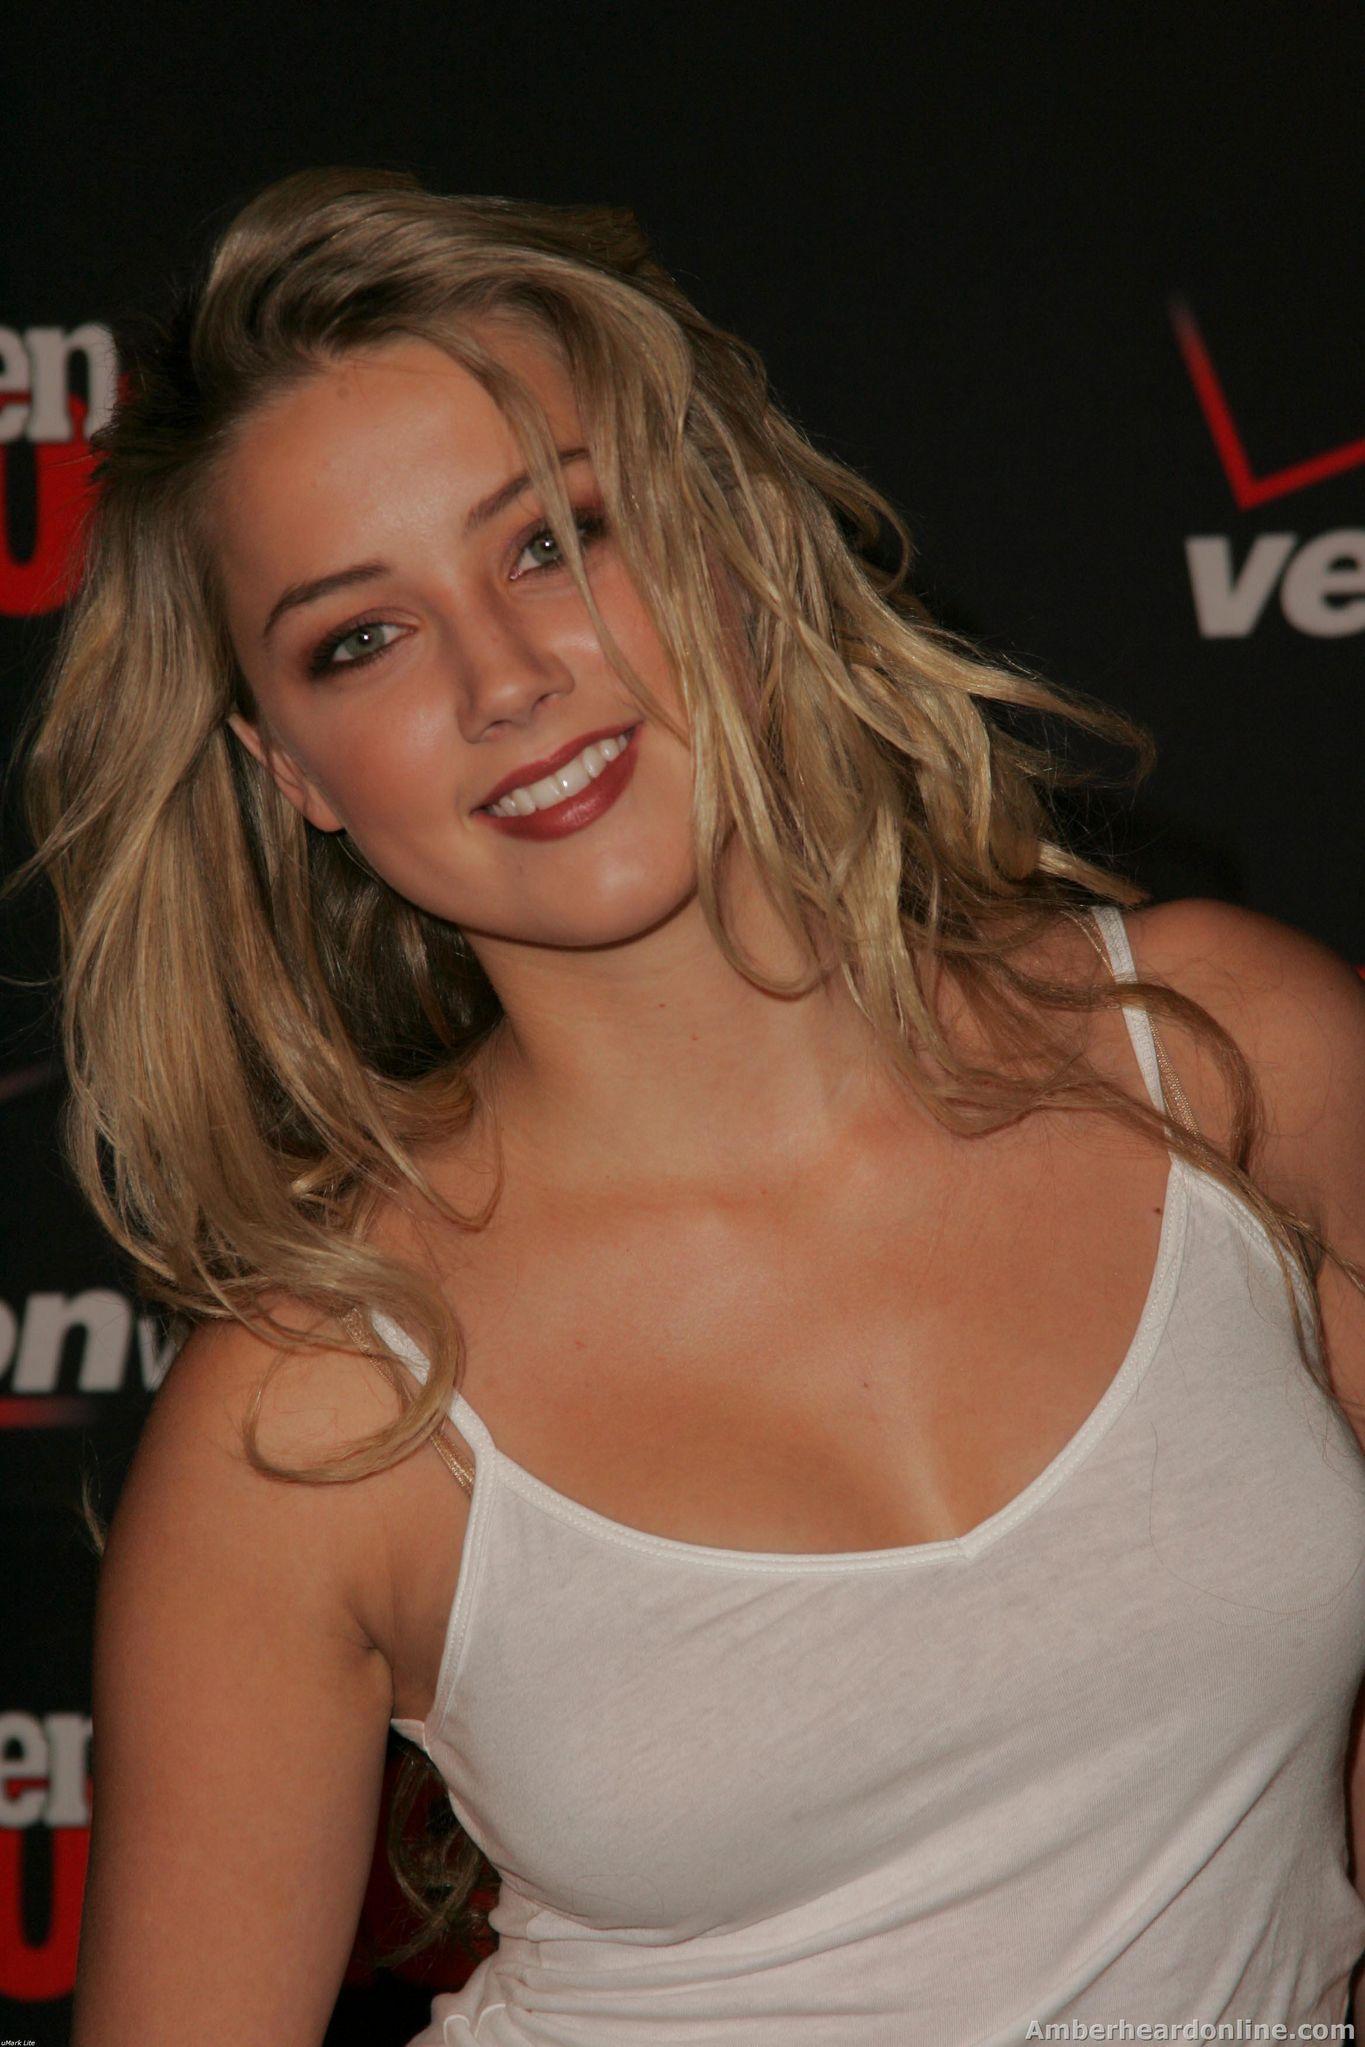 Amber Heard Desnuda Página 14 Fotos Desnuda Descuido Topless